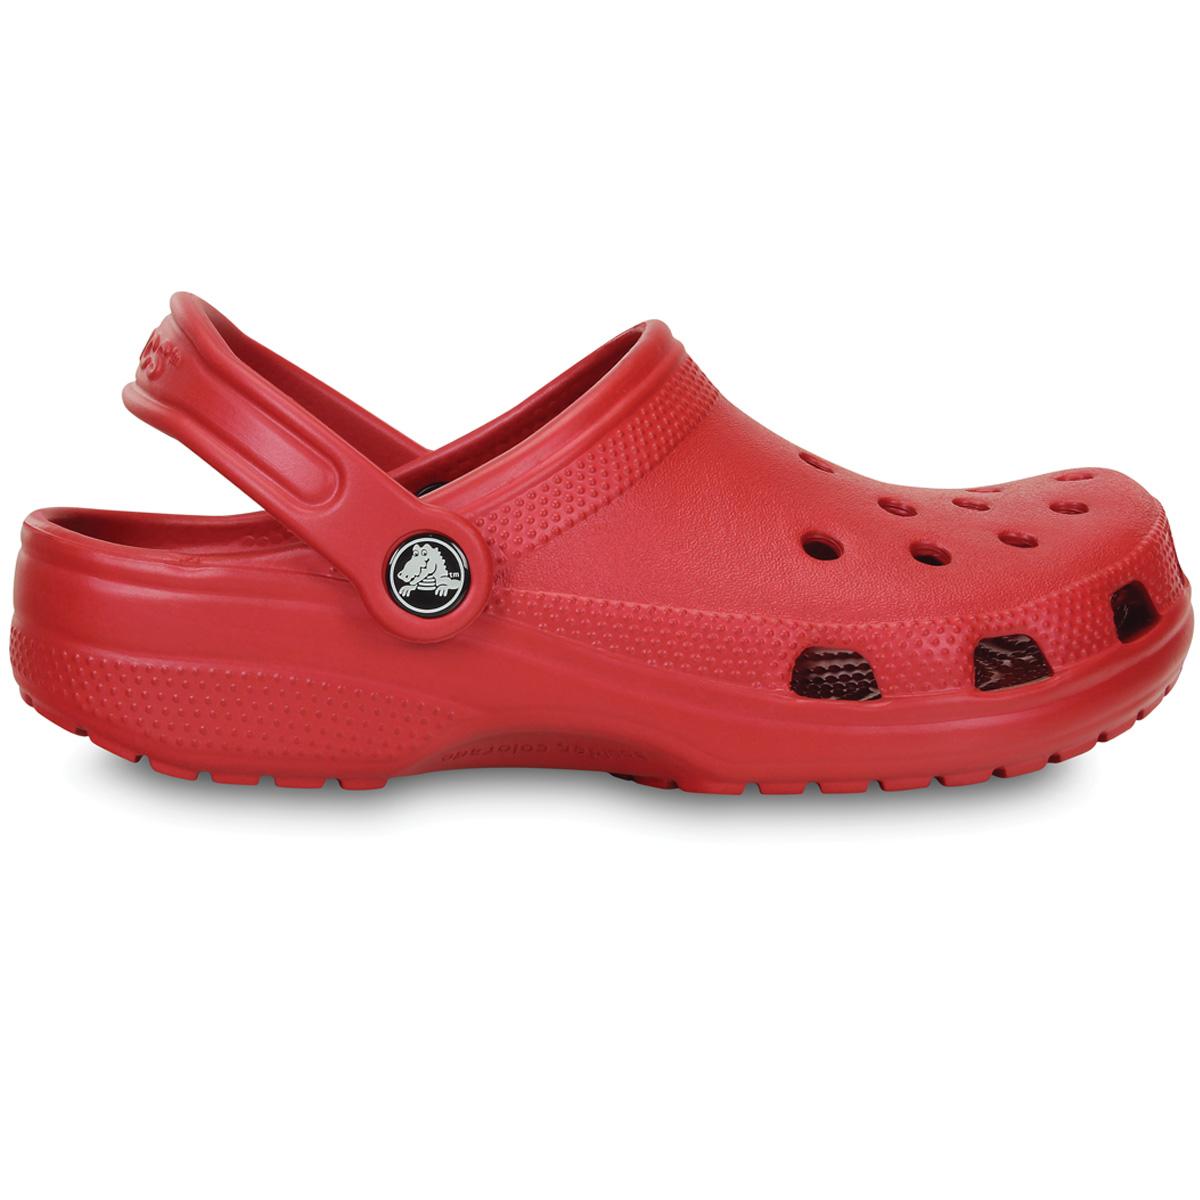 Crocs Classic - Biber